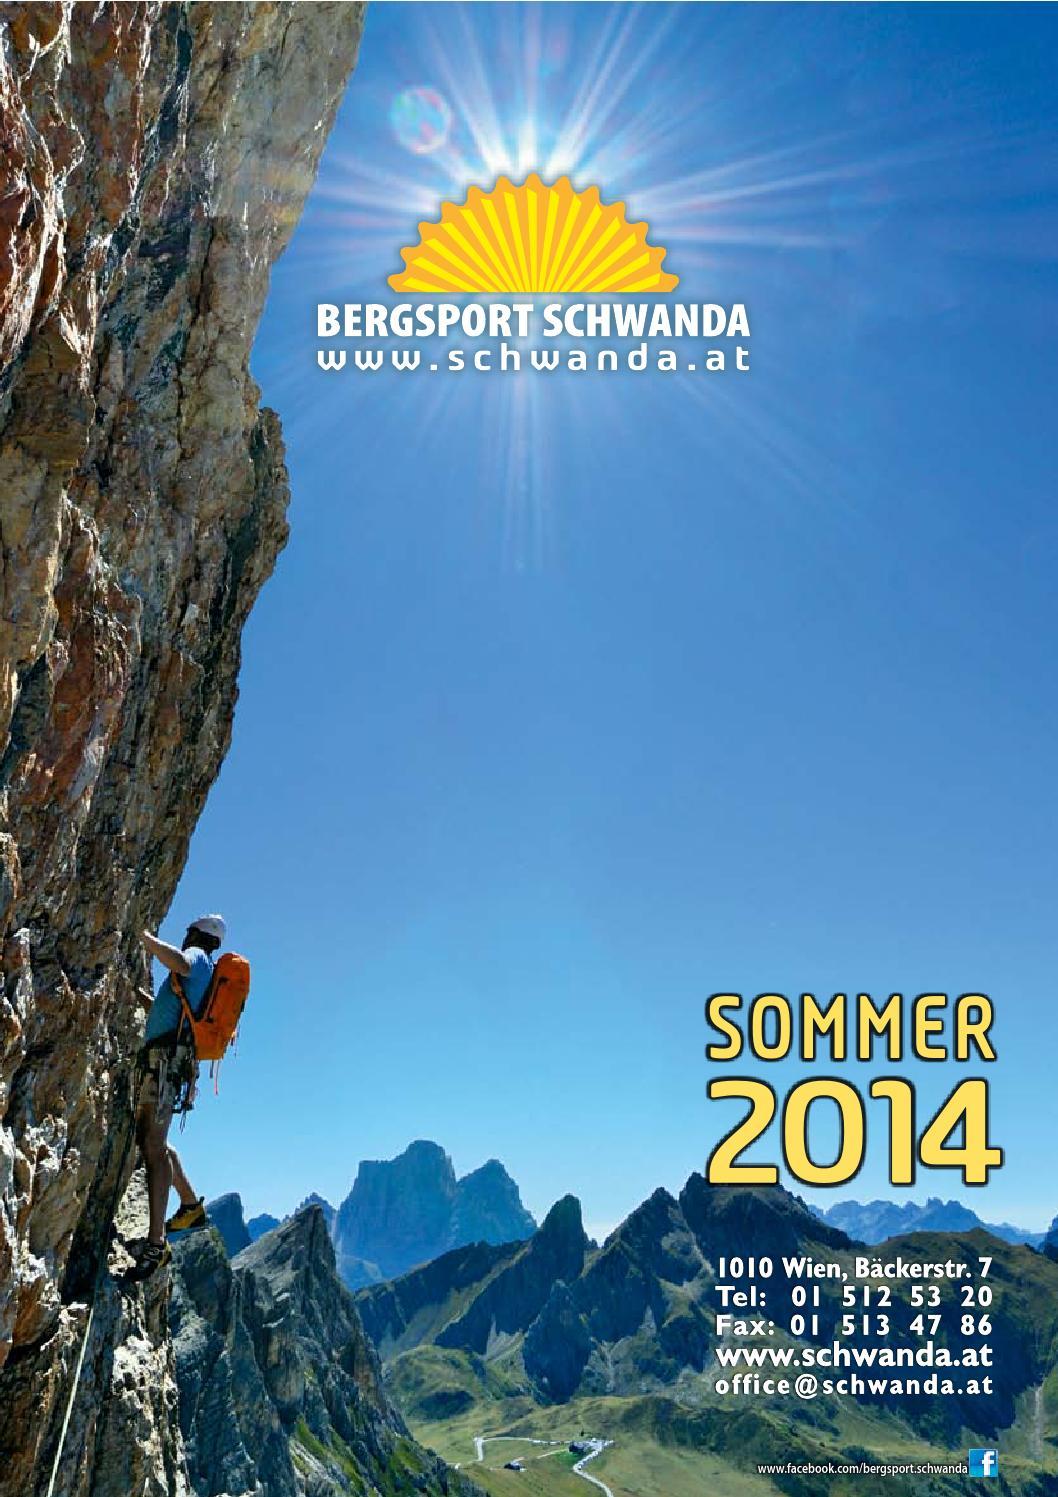 Issuu Sommer Schwanda 2014 schwanda Bergsport By Bergsport Super nP80kwO